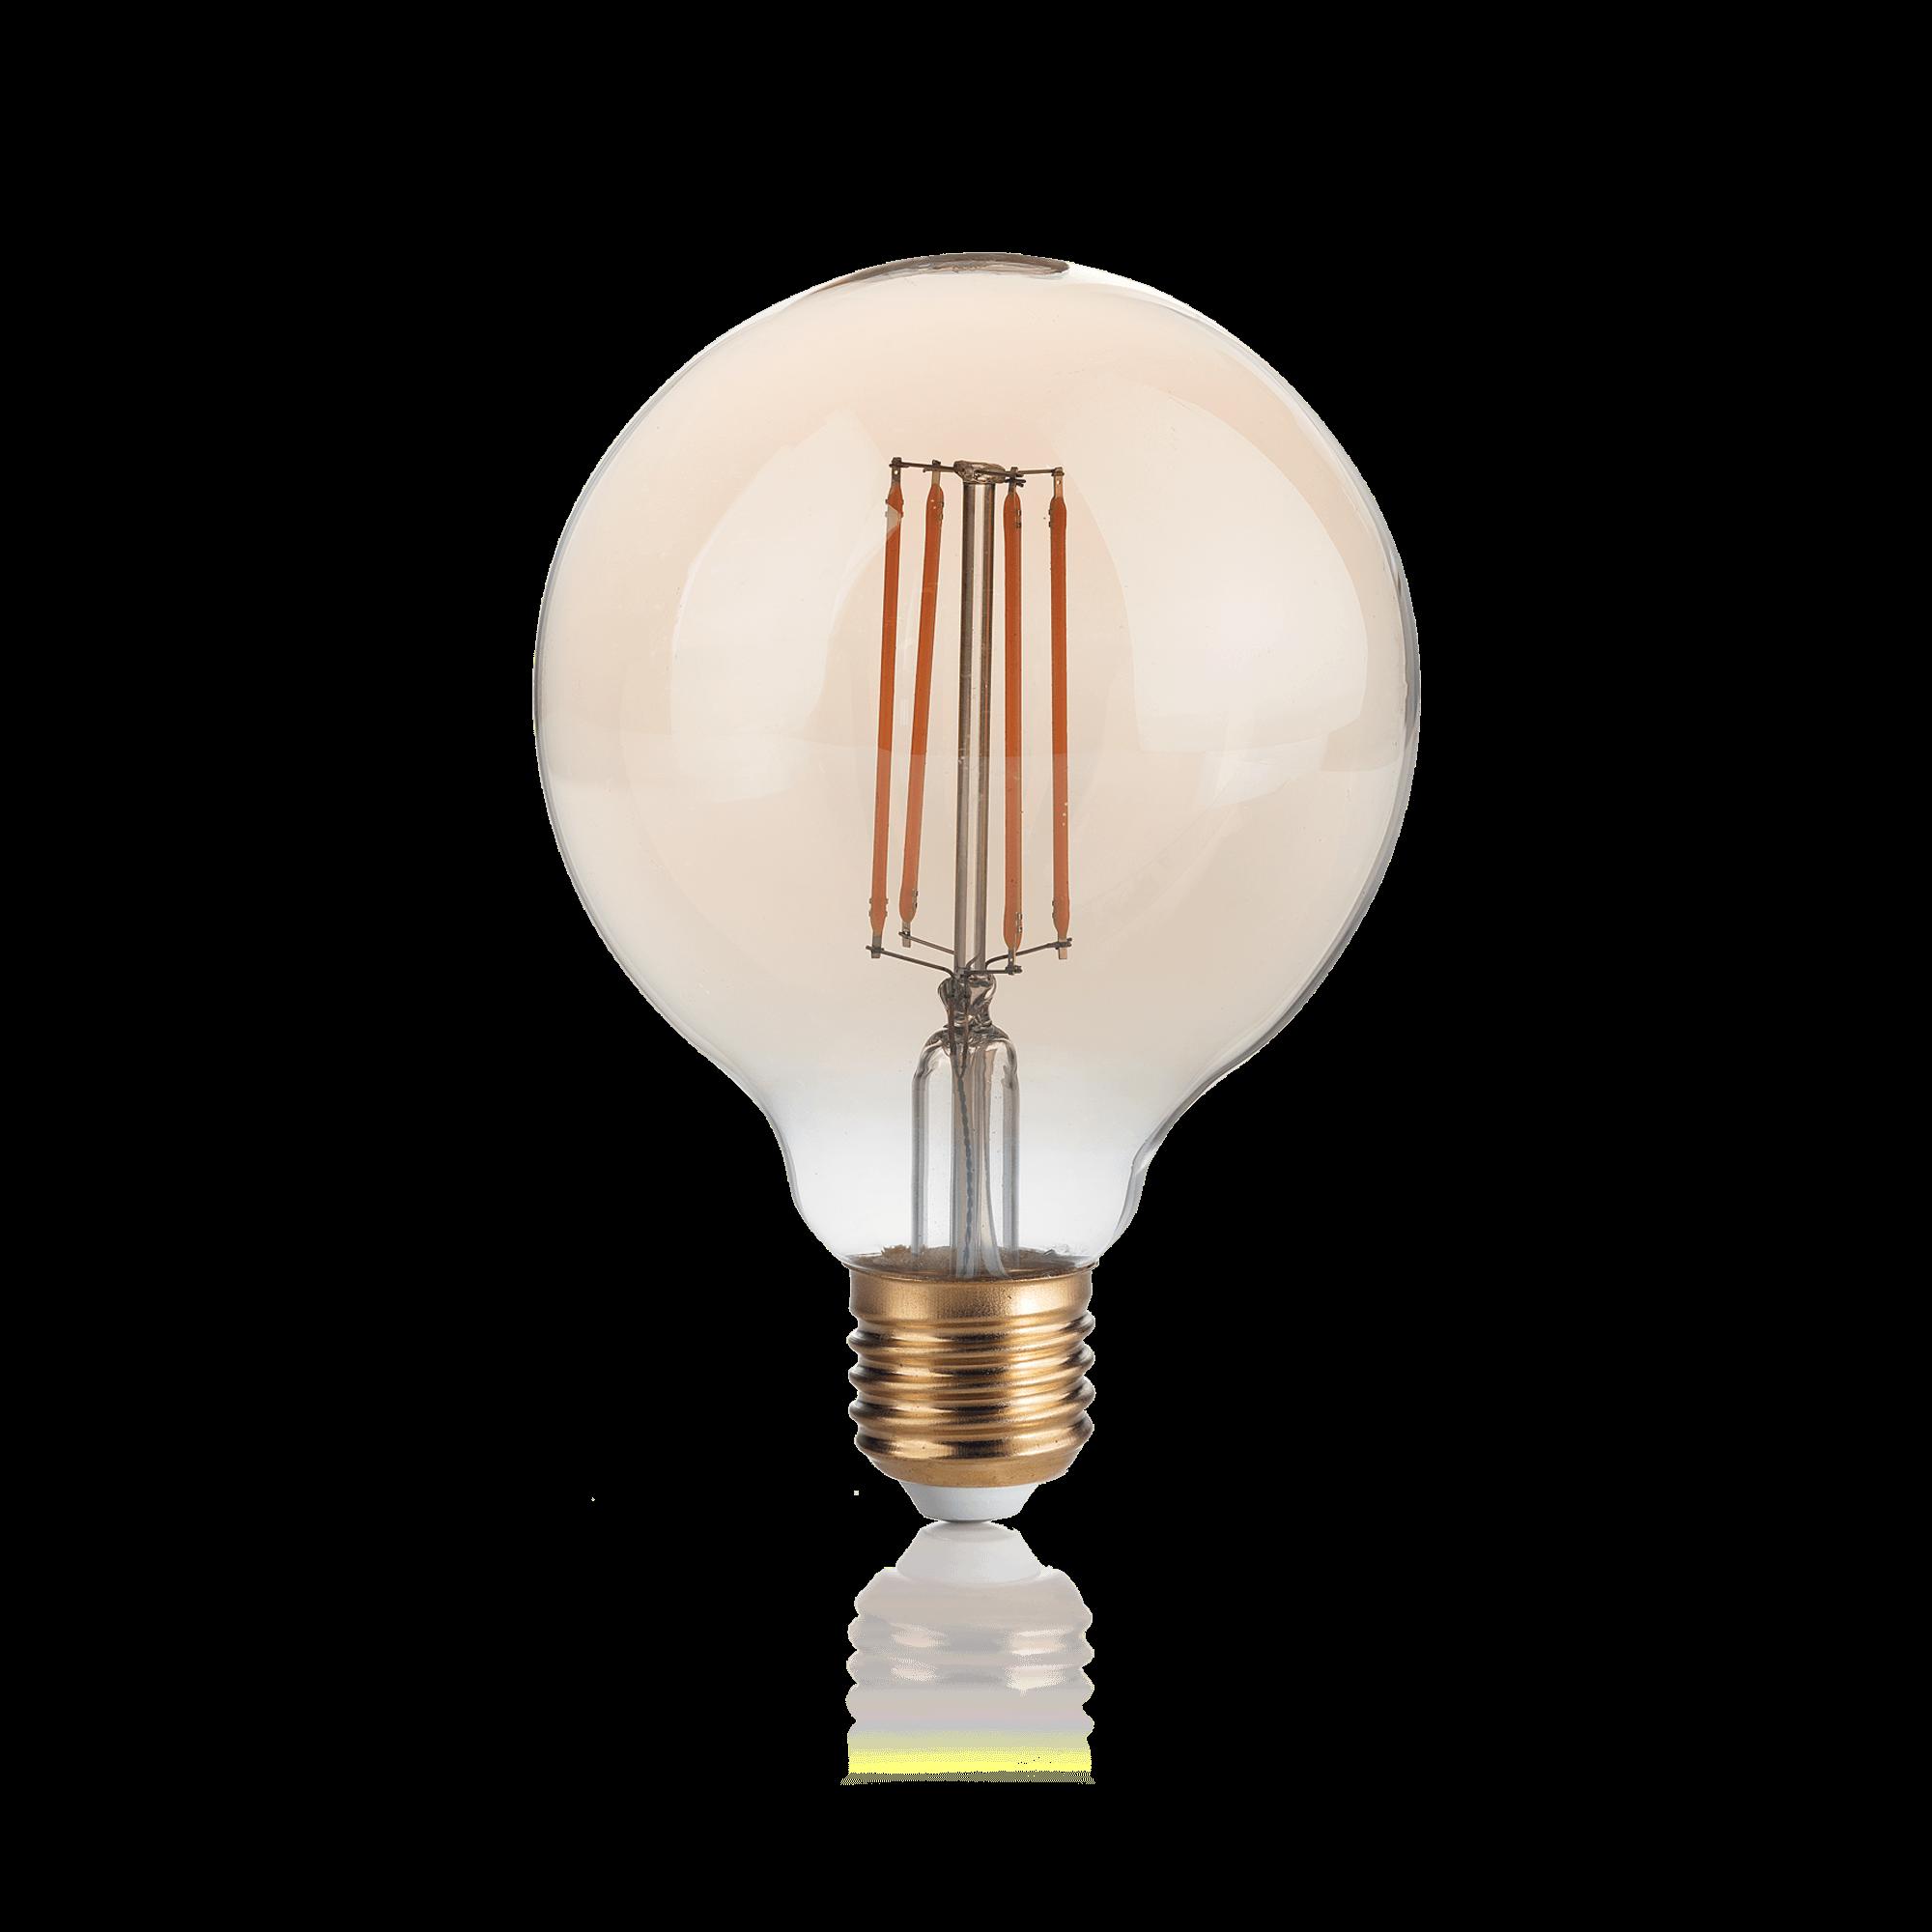 Филаментная светодиодная лампа Ideal Lux LAMPADINA VINTAGE E27 4W GLOBO SMALL 151717 G95 E27 4W 2200K (теплый) 240V - фото 1